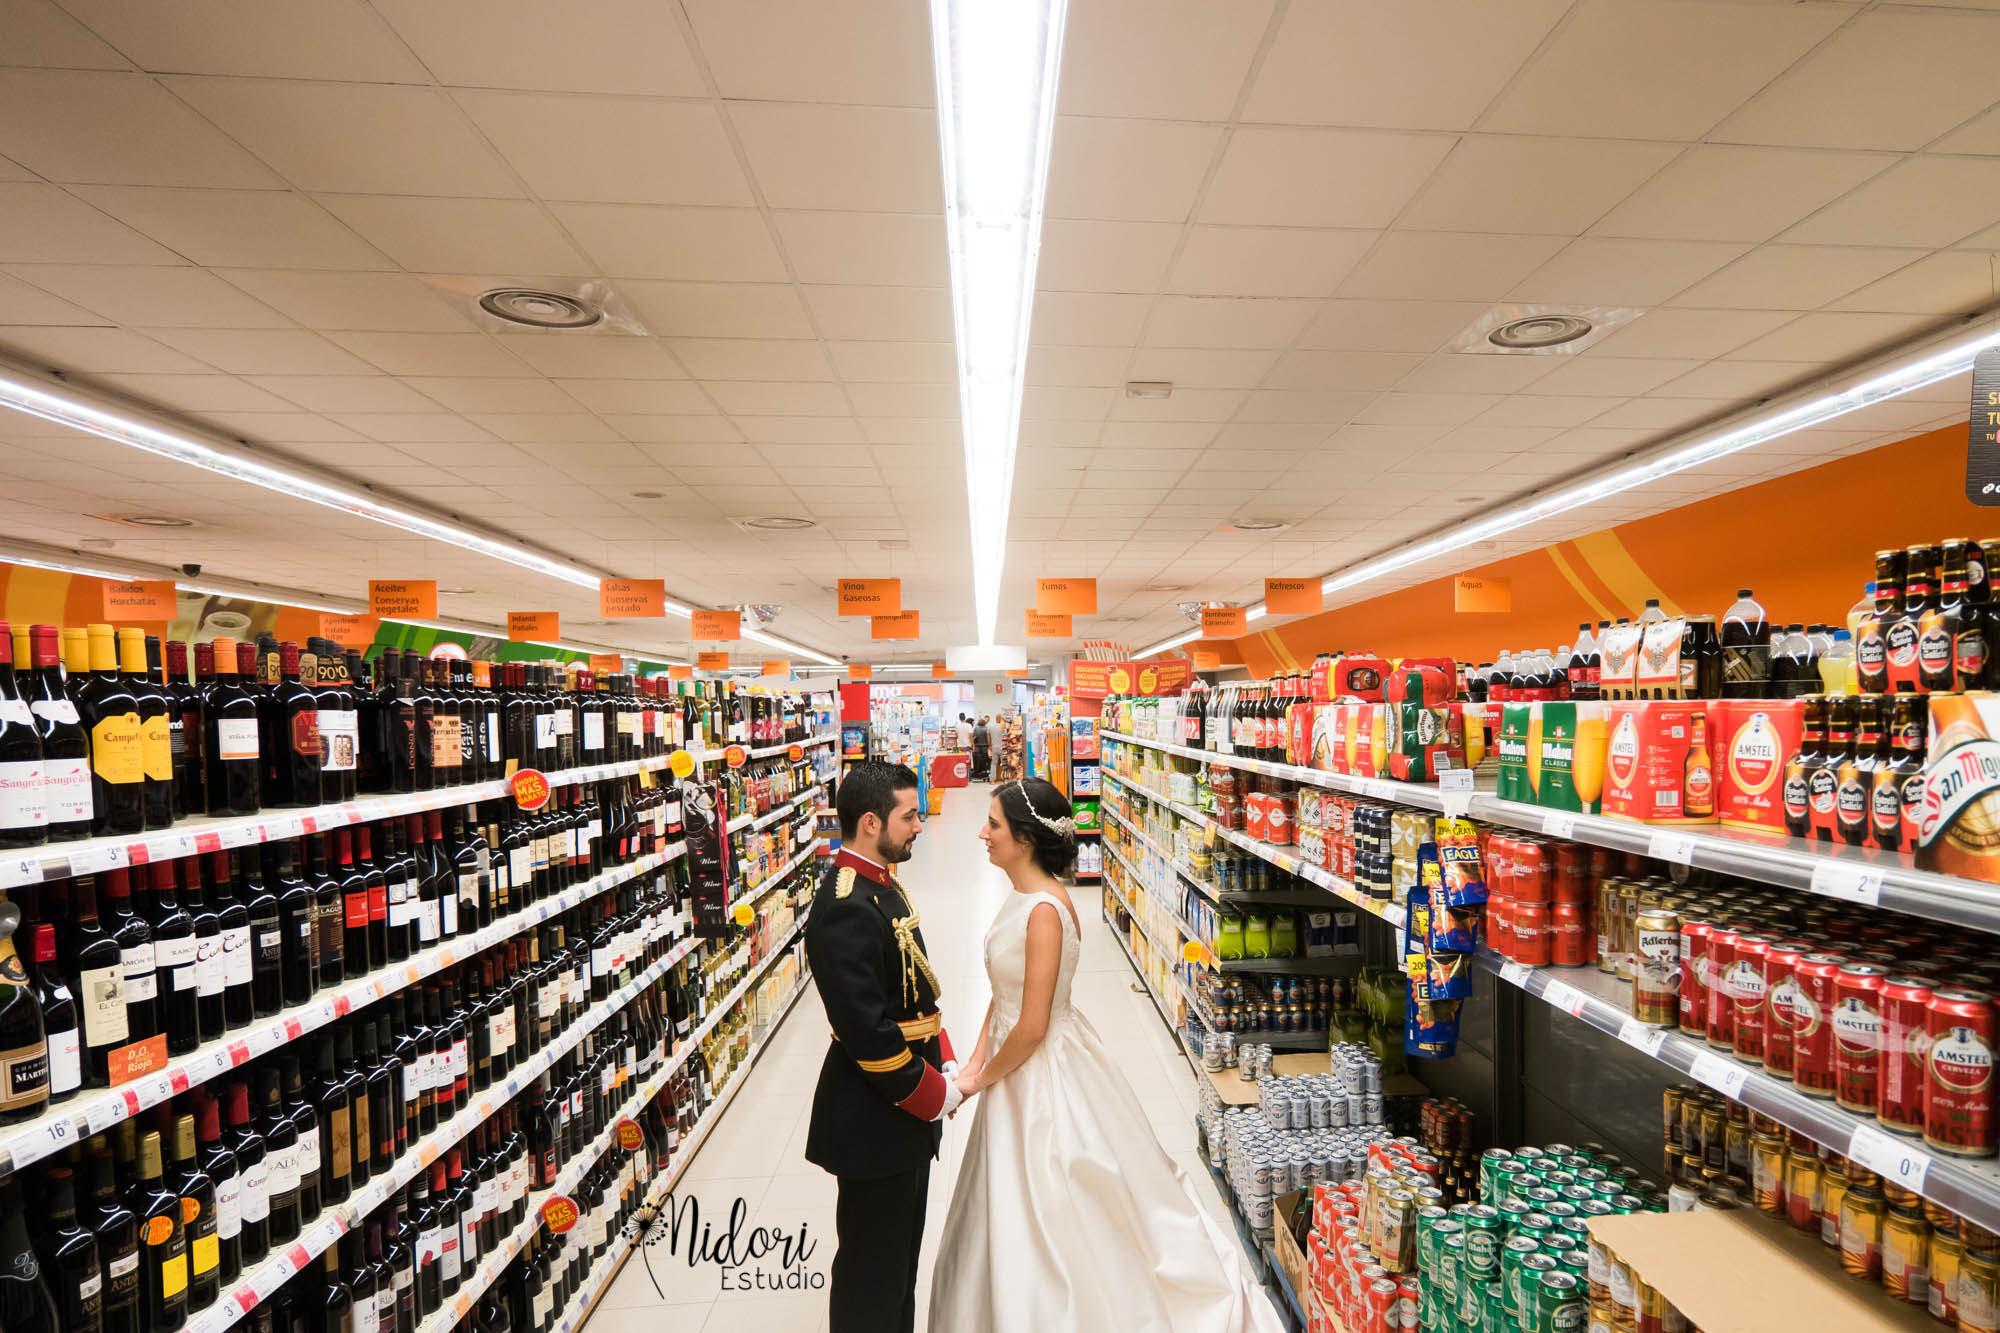 fotos-de-boda-reportaje-novios-fotografia-boda-nidoriestudio-fotos-valencia-almazora-castellon-españa-spain-008